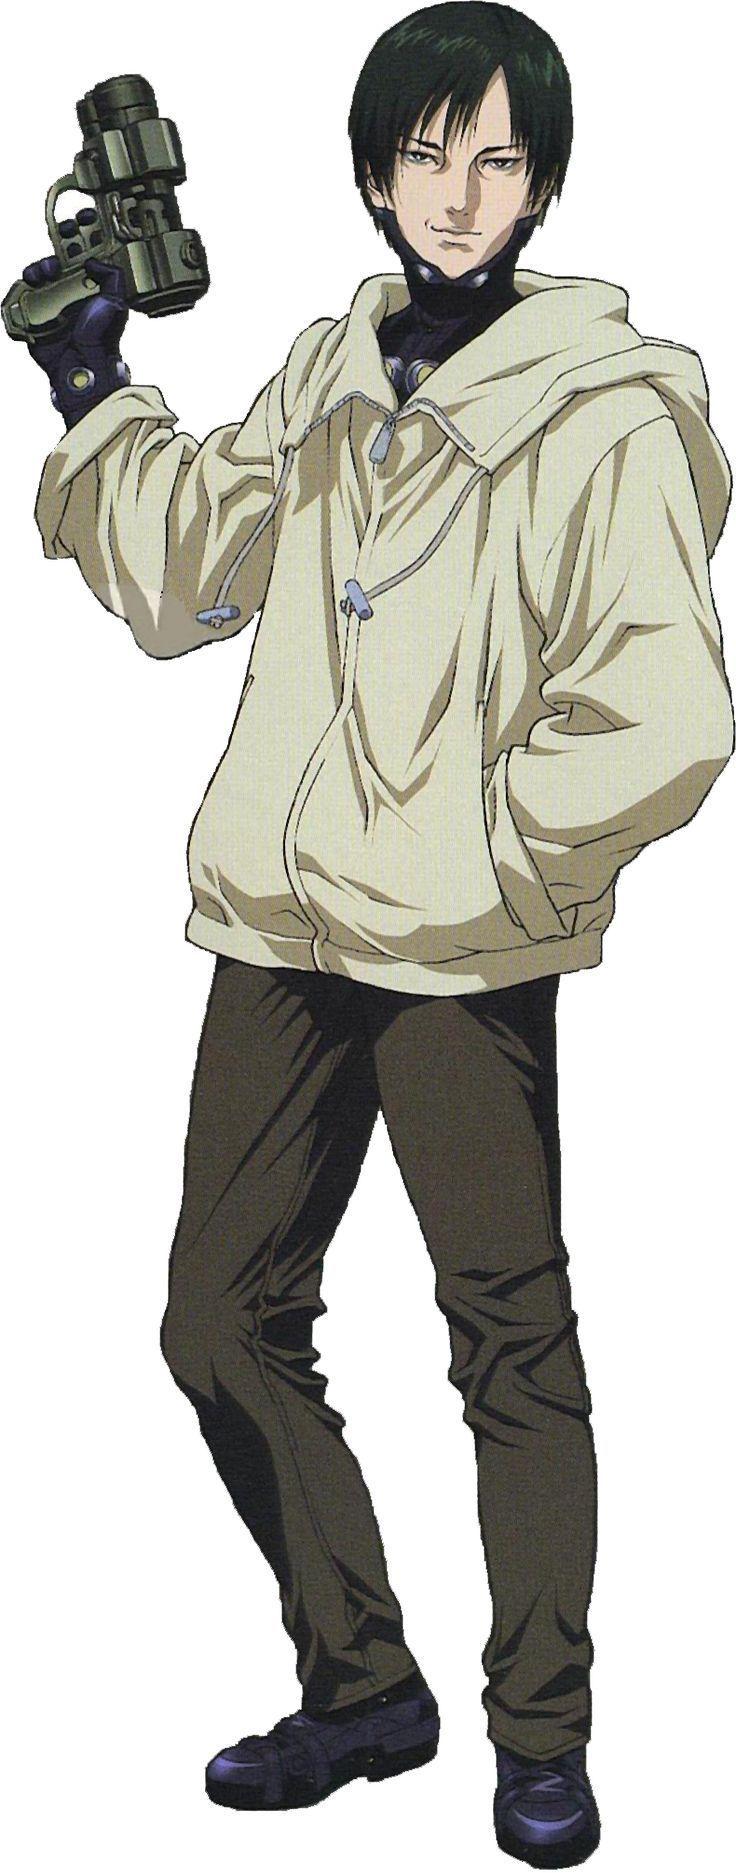 Joichero Nishi from Gantz , gantz joichero nishi